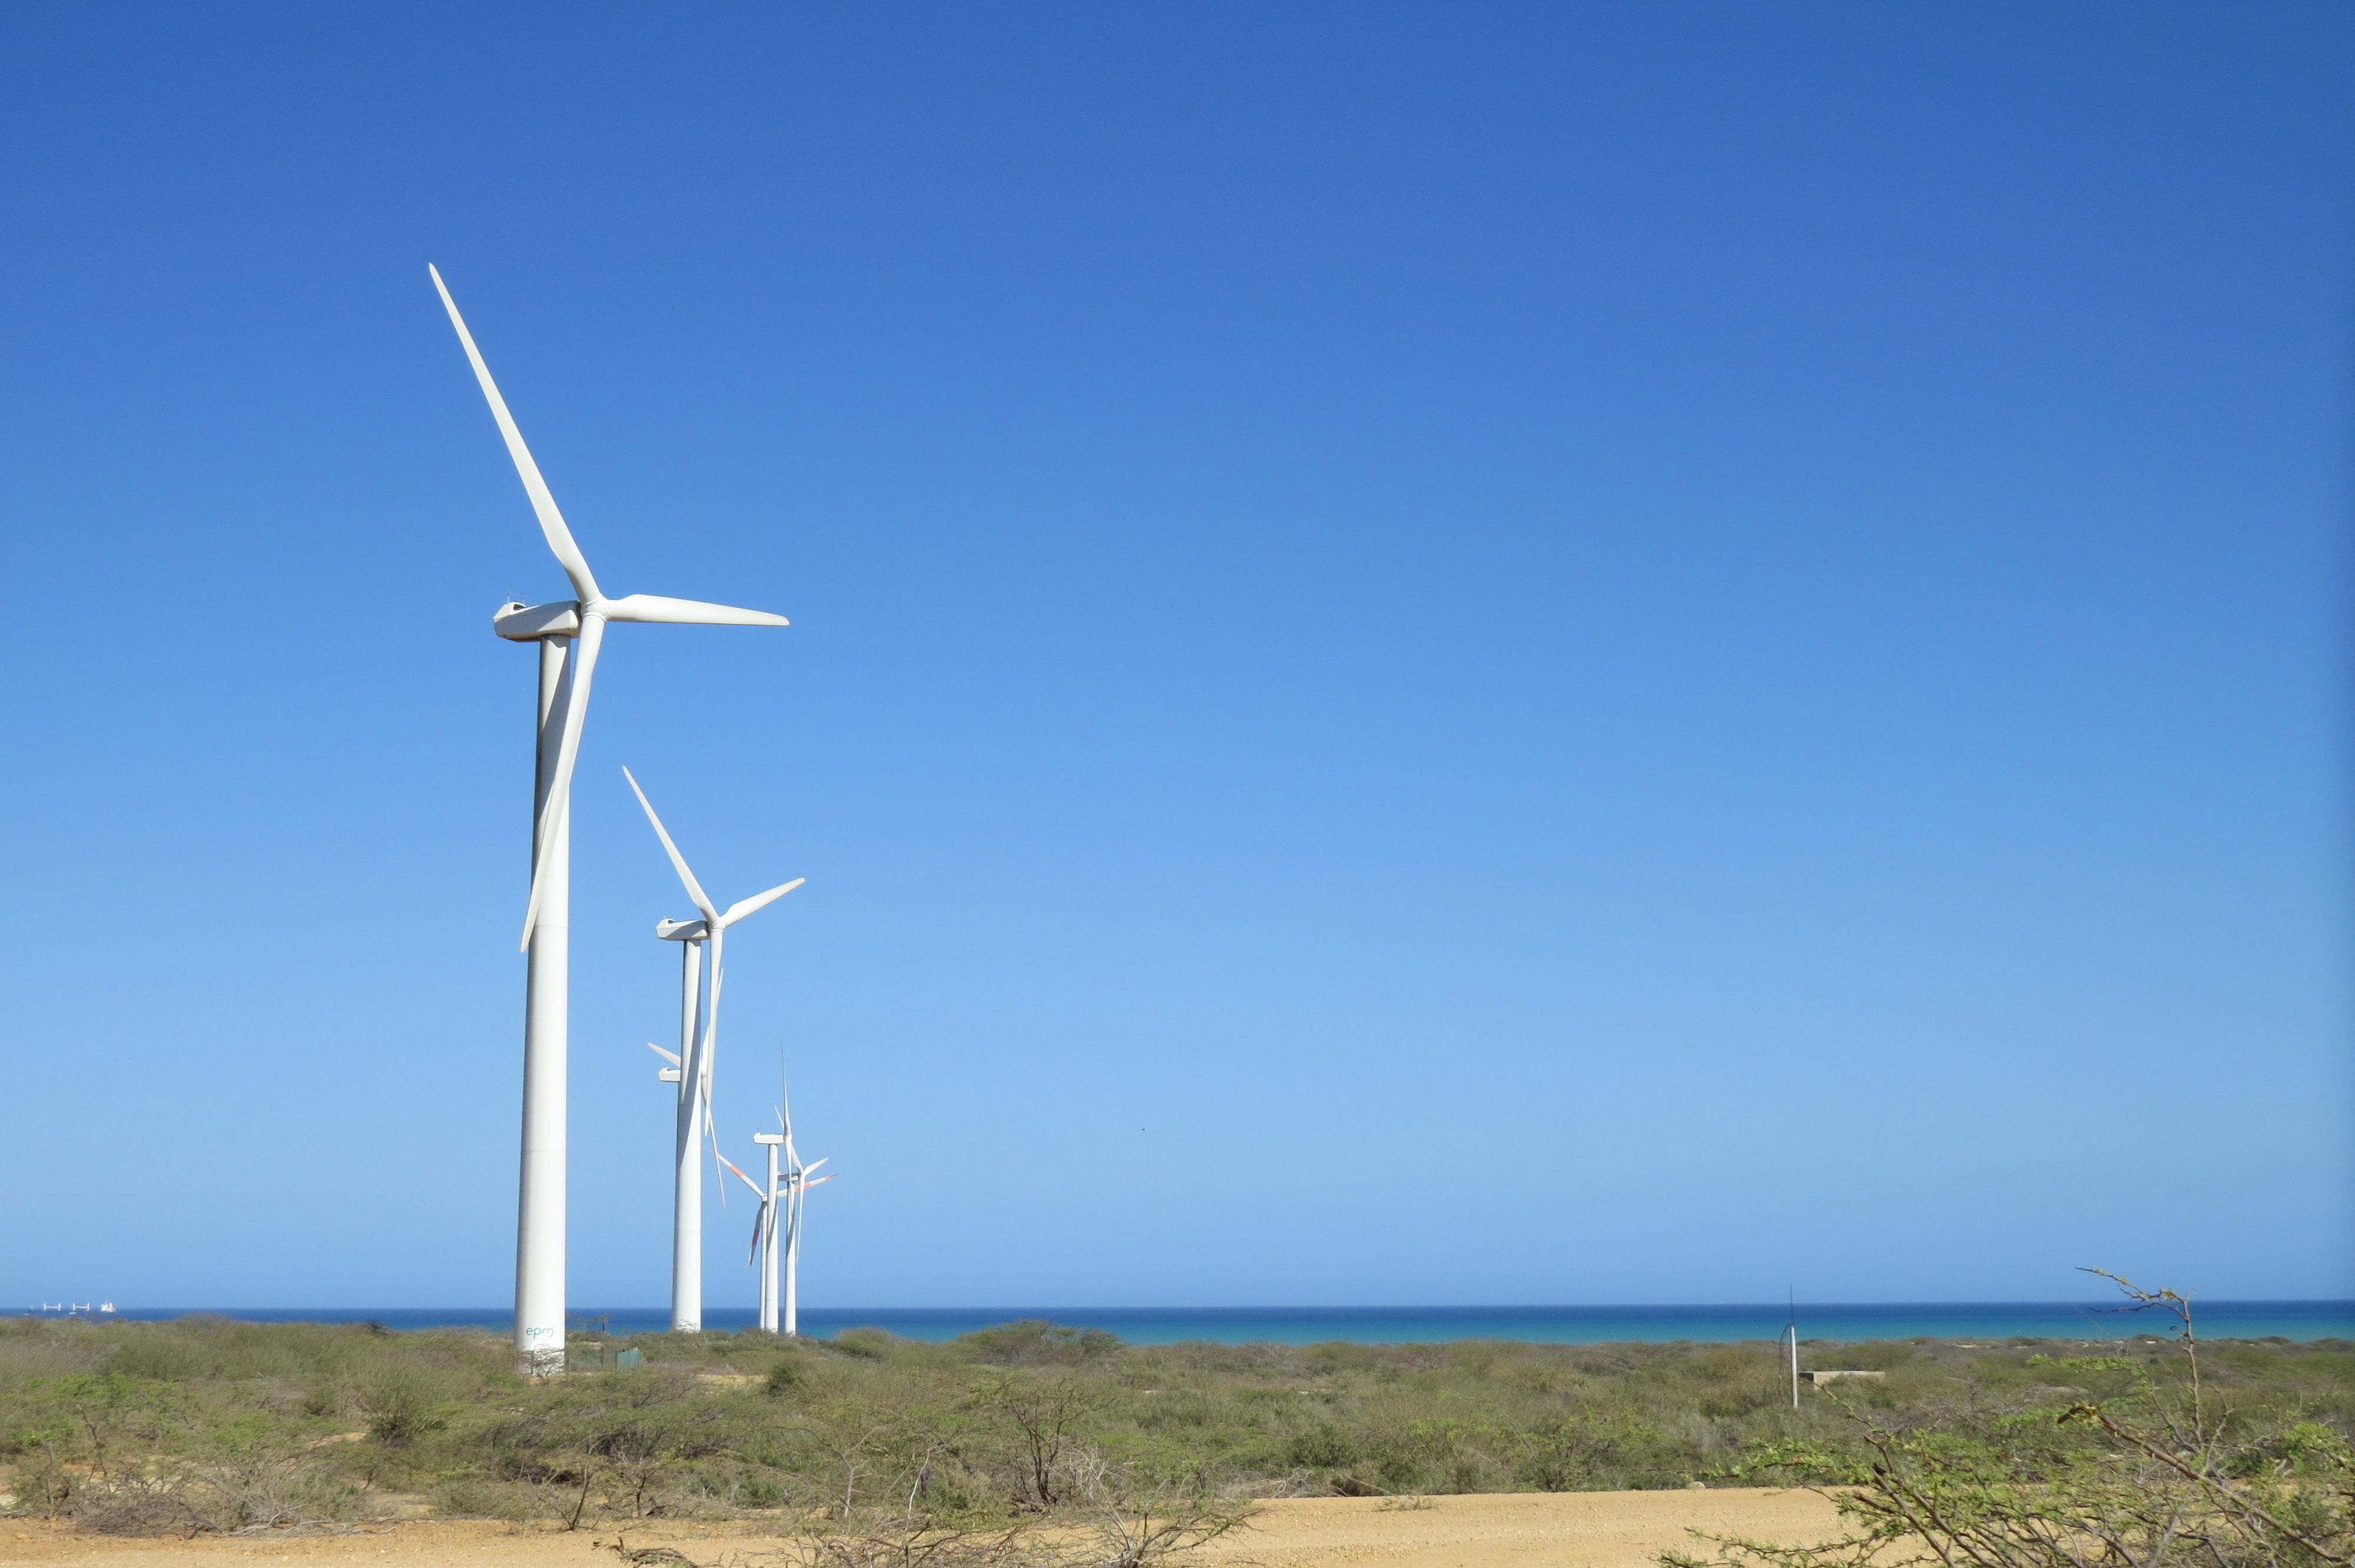 molinos de viento guajira parque eólico alta guajira pinterest